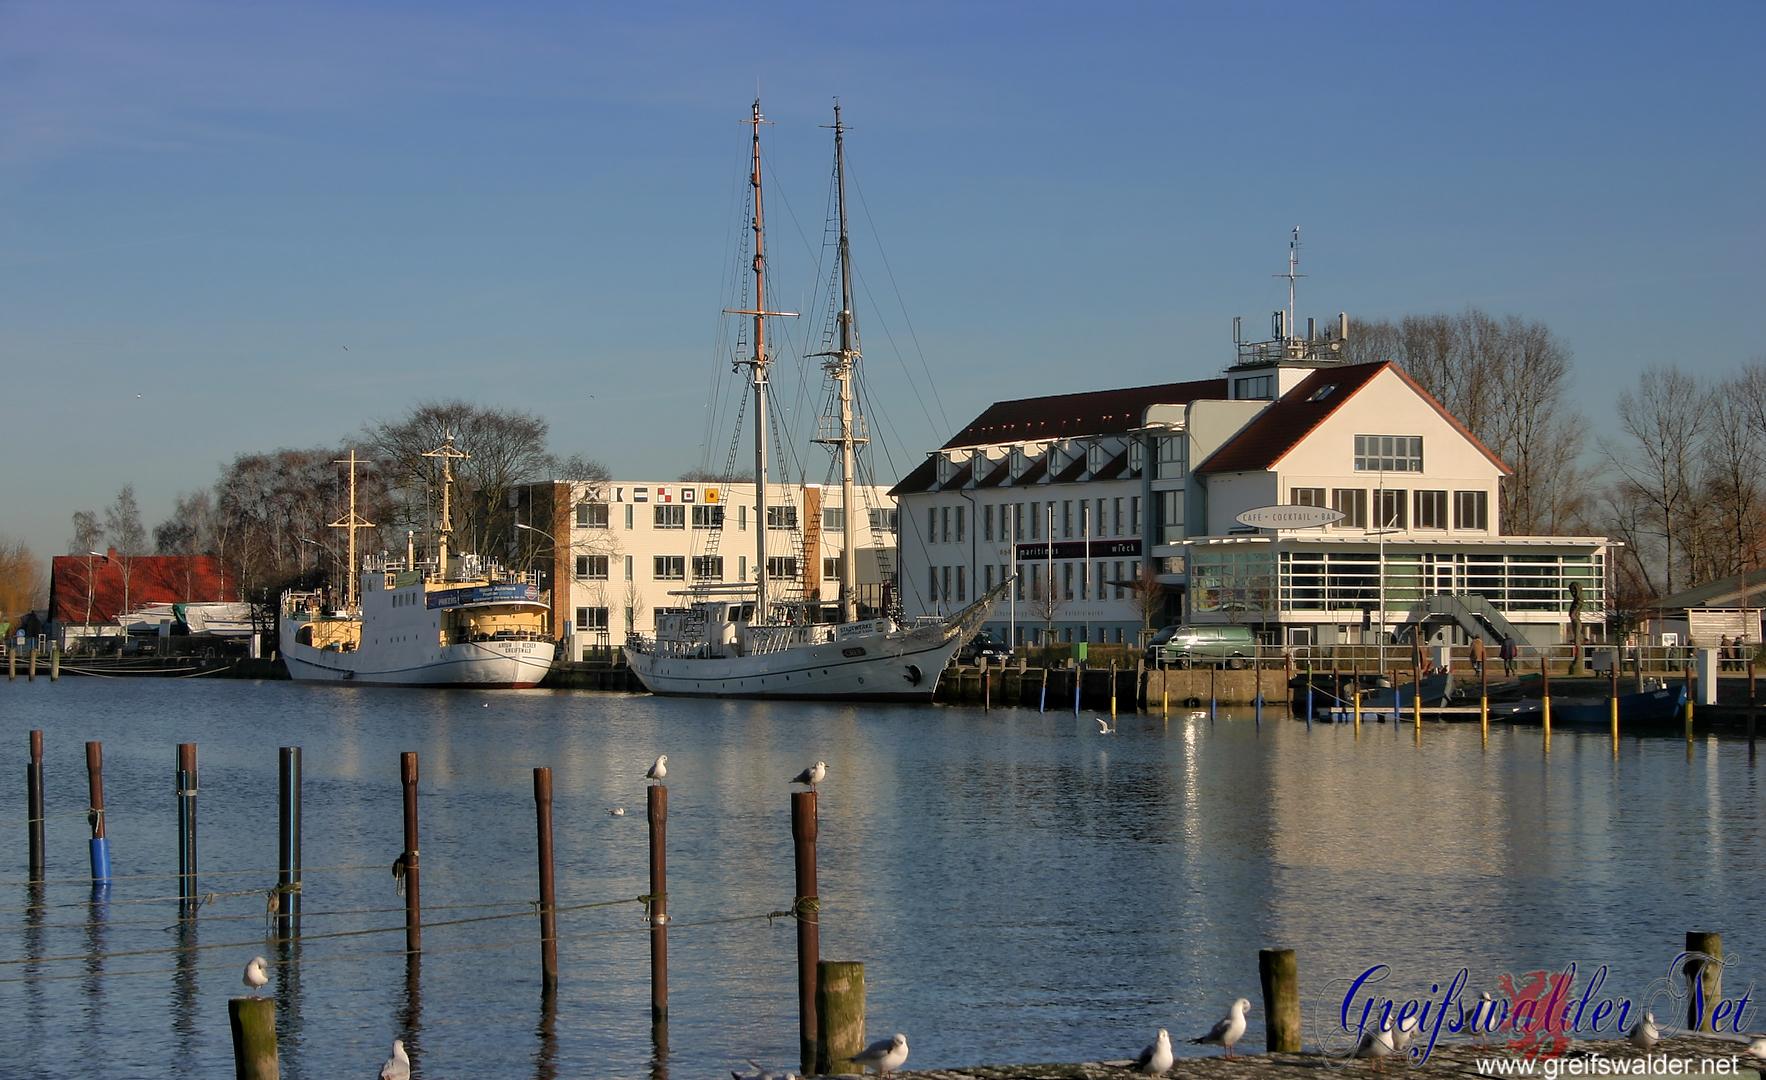 Hafen Greifswald-Wieck im Februar 2008